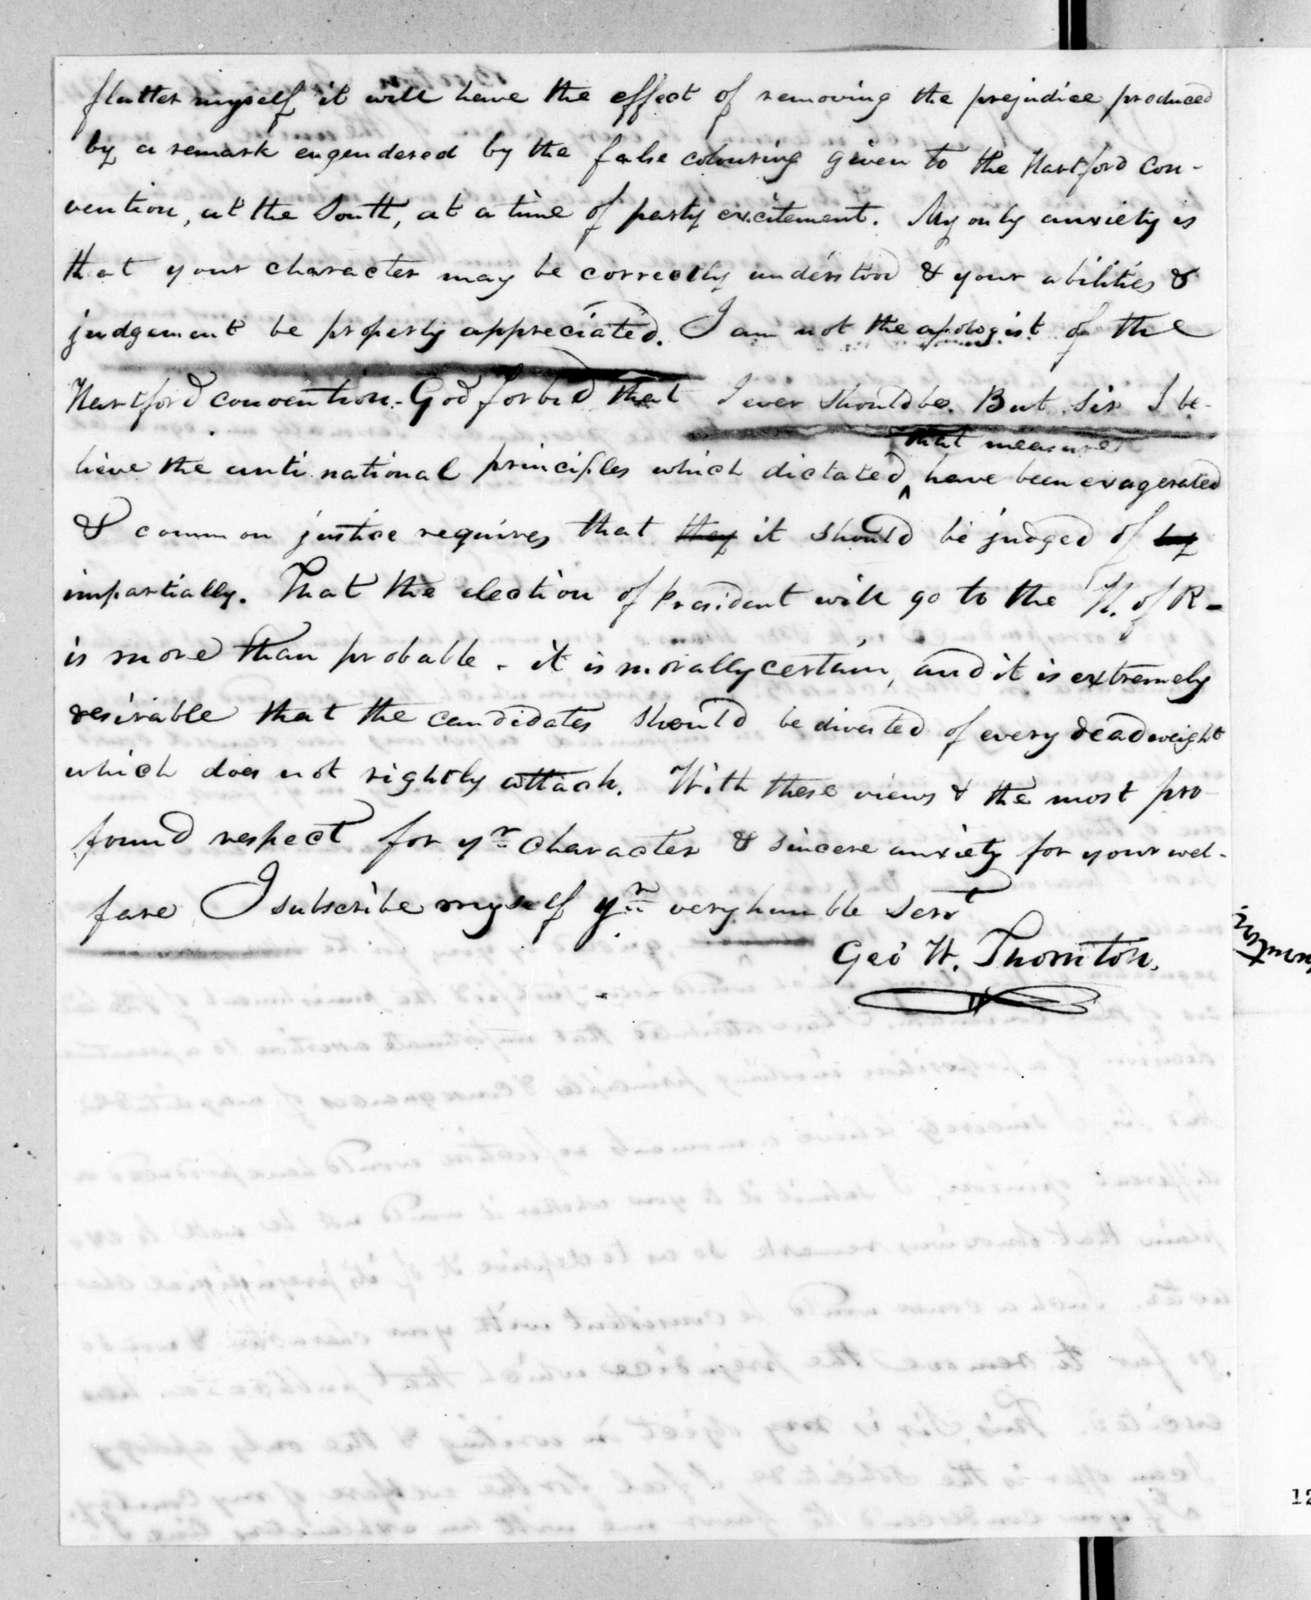 George W. Thornton to Andrew Jackson, June 26, 1824